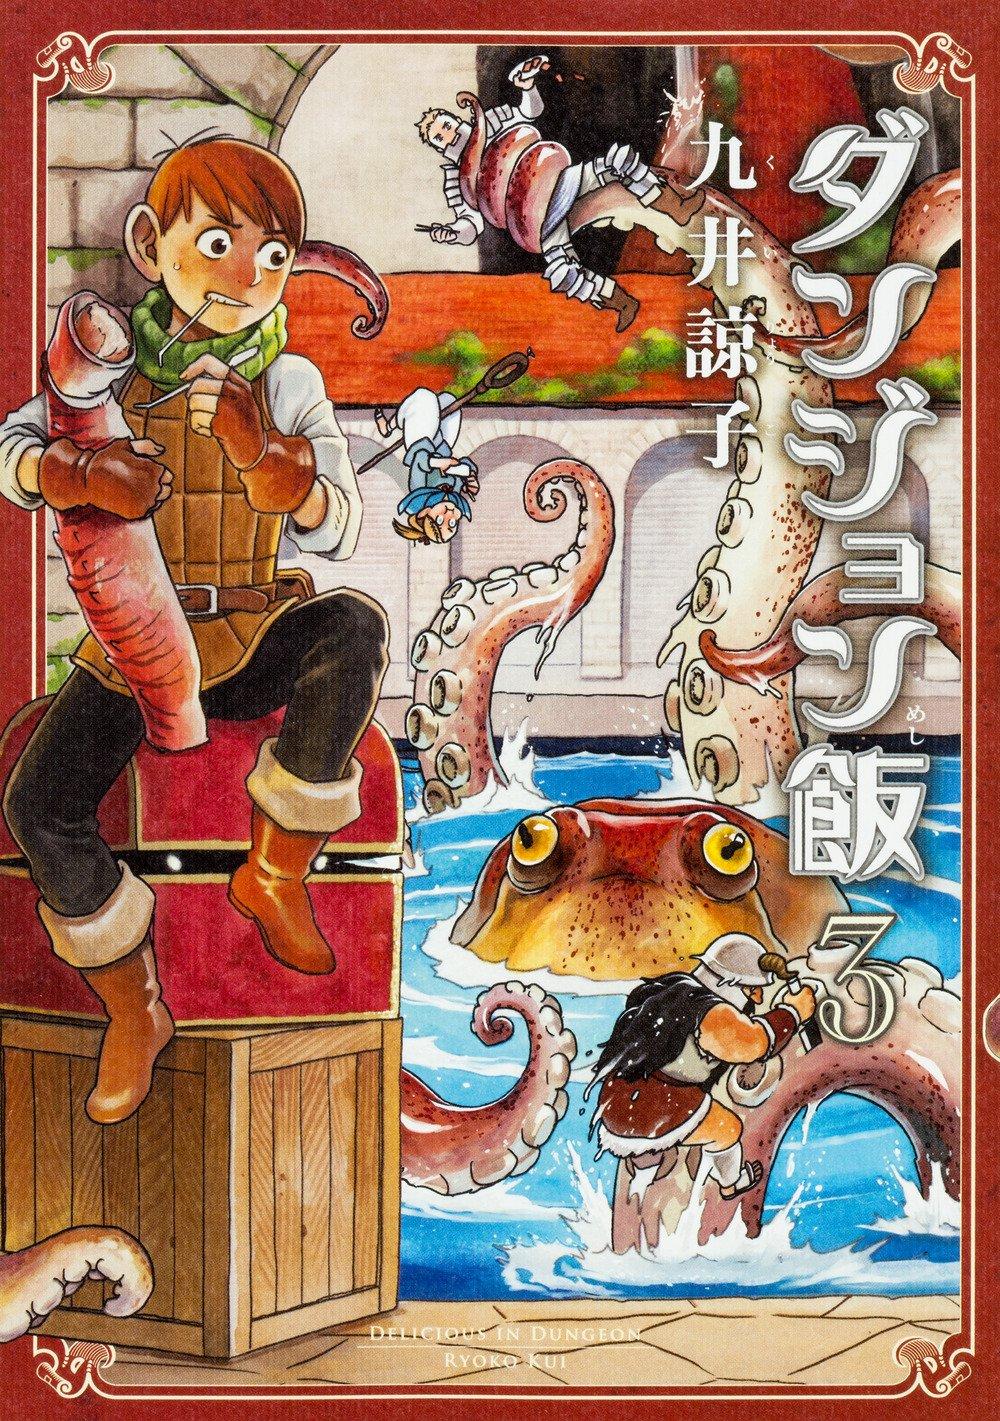 Delicious in Dungeon, Vol. 3 Ryoko Kui